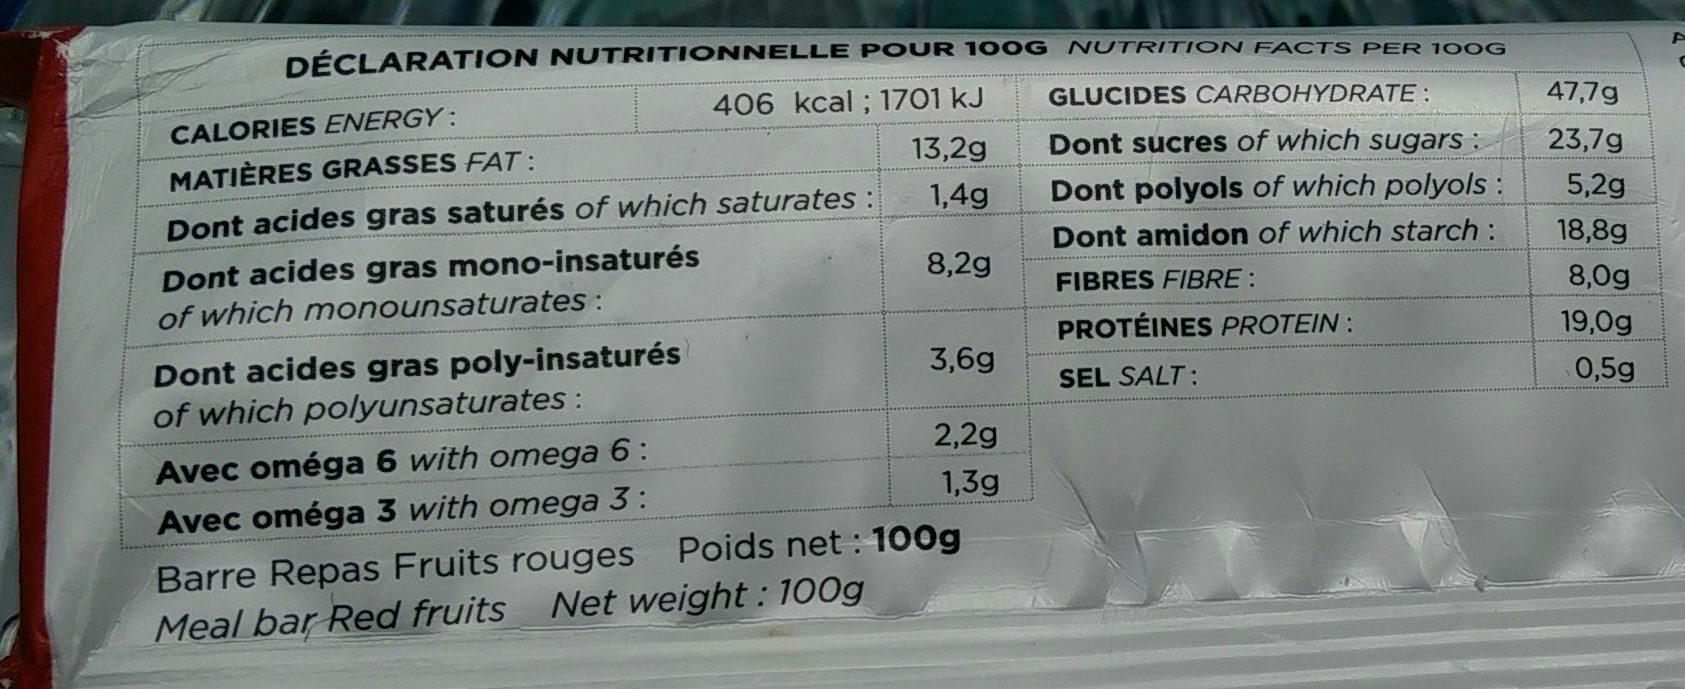 Barre repas fruit rouge - Informació nutricional